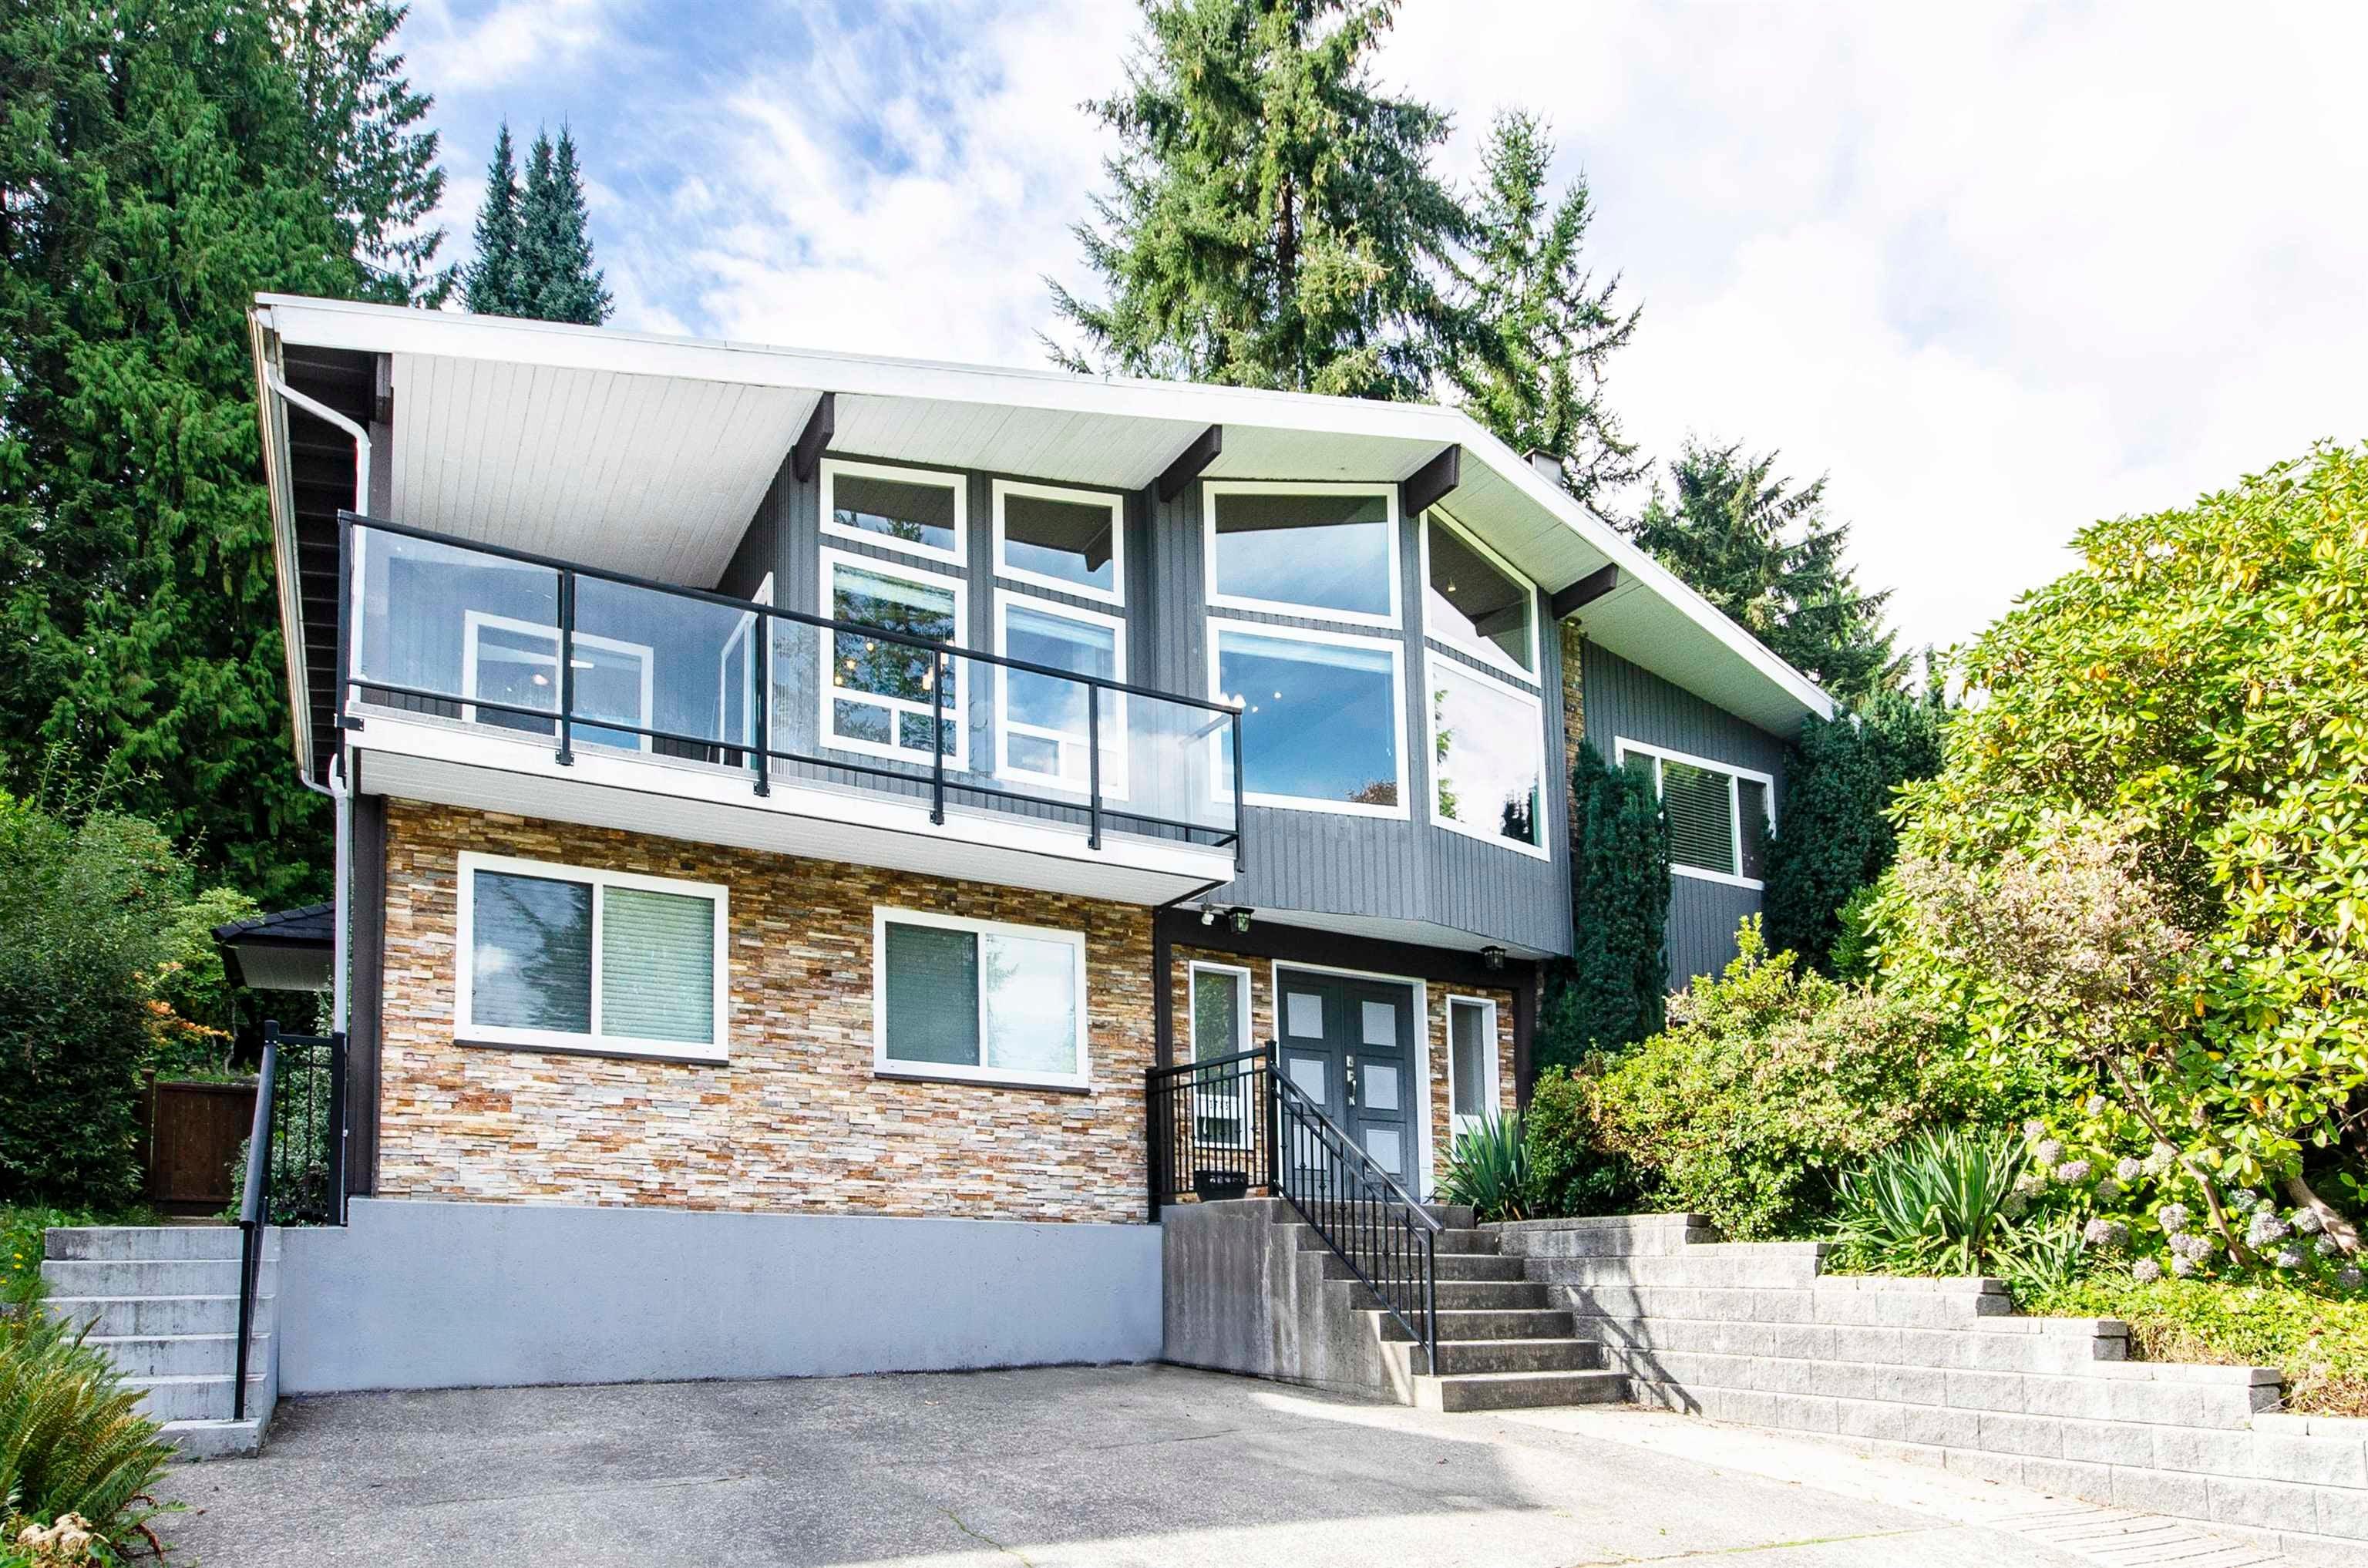 3785 REGENT AVENUE - Upper Lonsdale House/Single Family for sale, 4 Bedrooms (R2617648) - #28